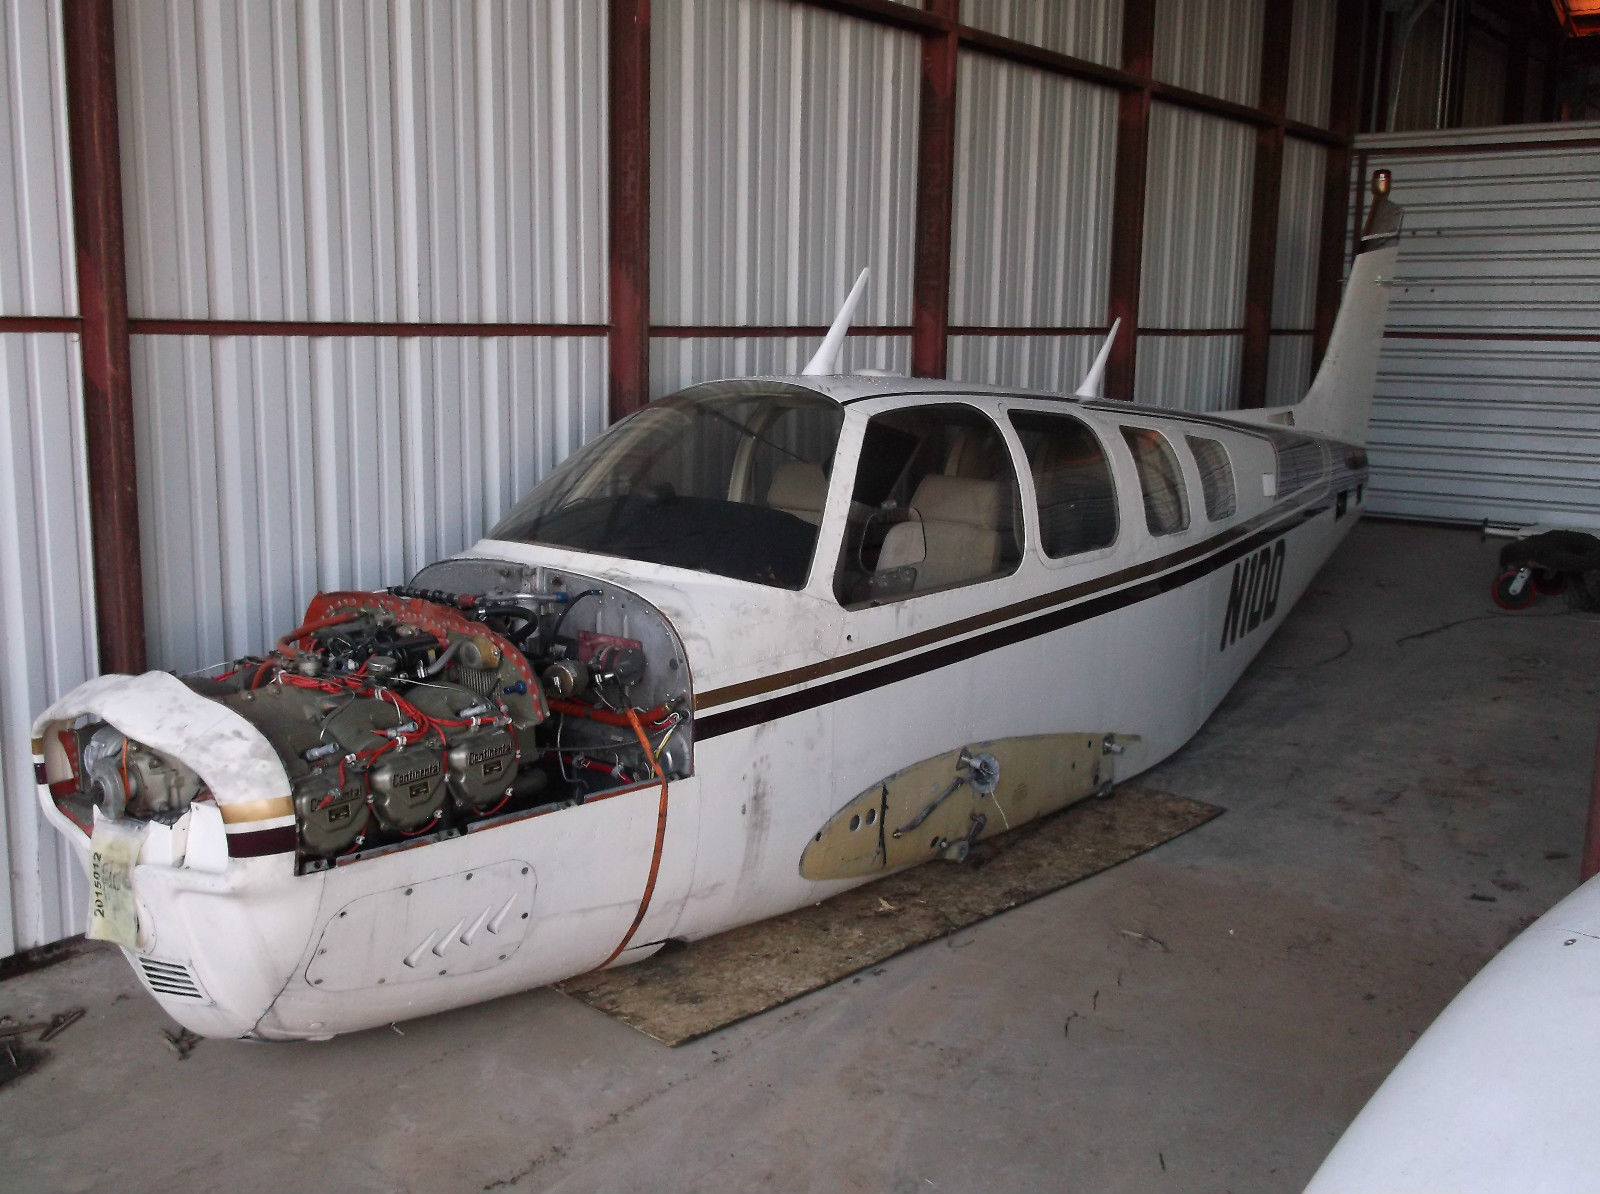 1969 Beech A 36 Bonanza